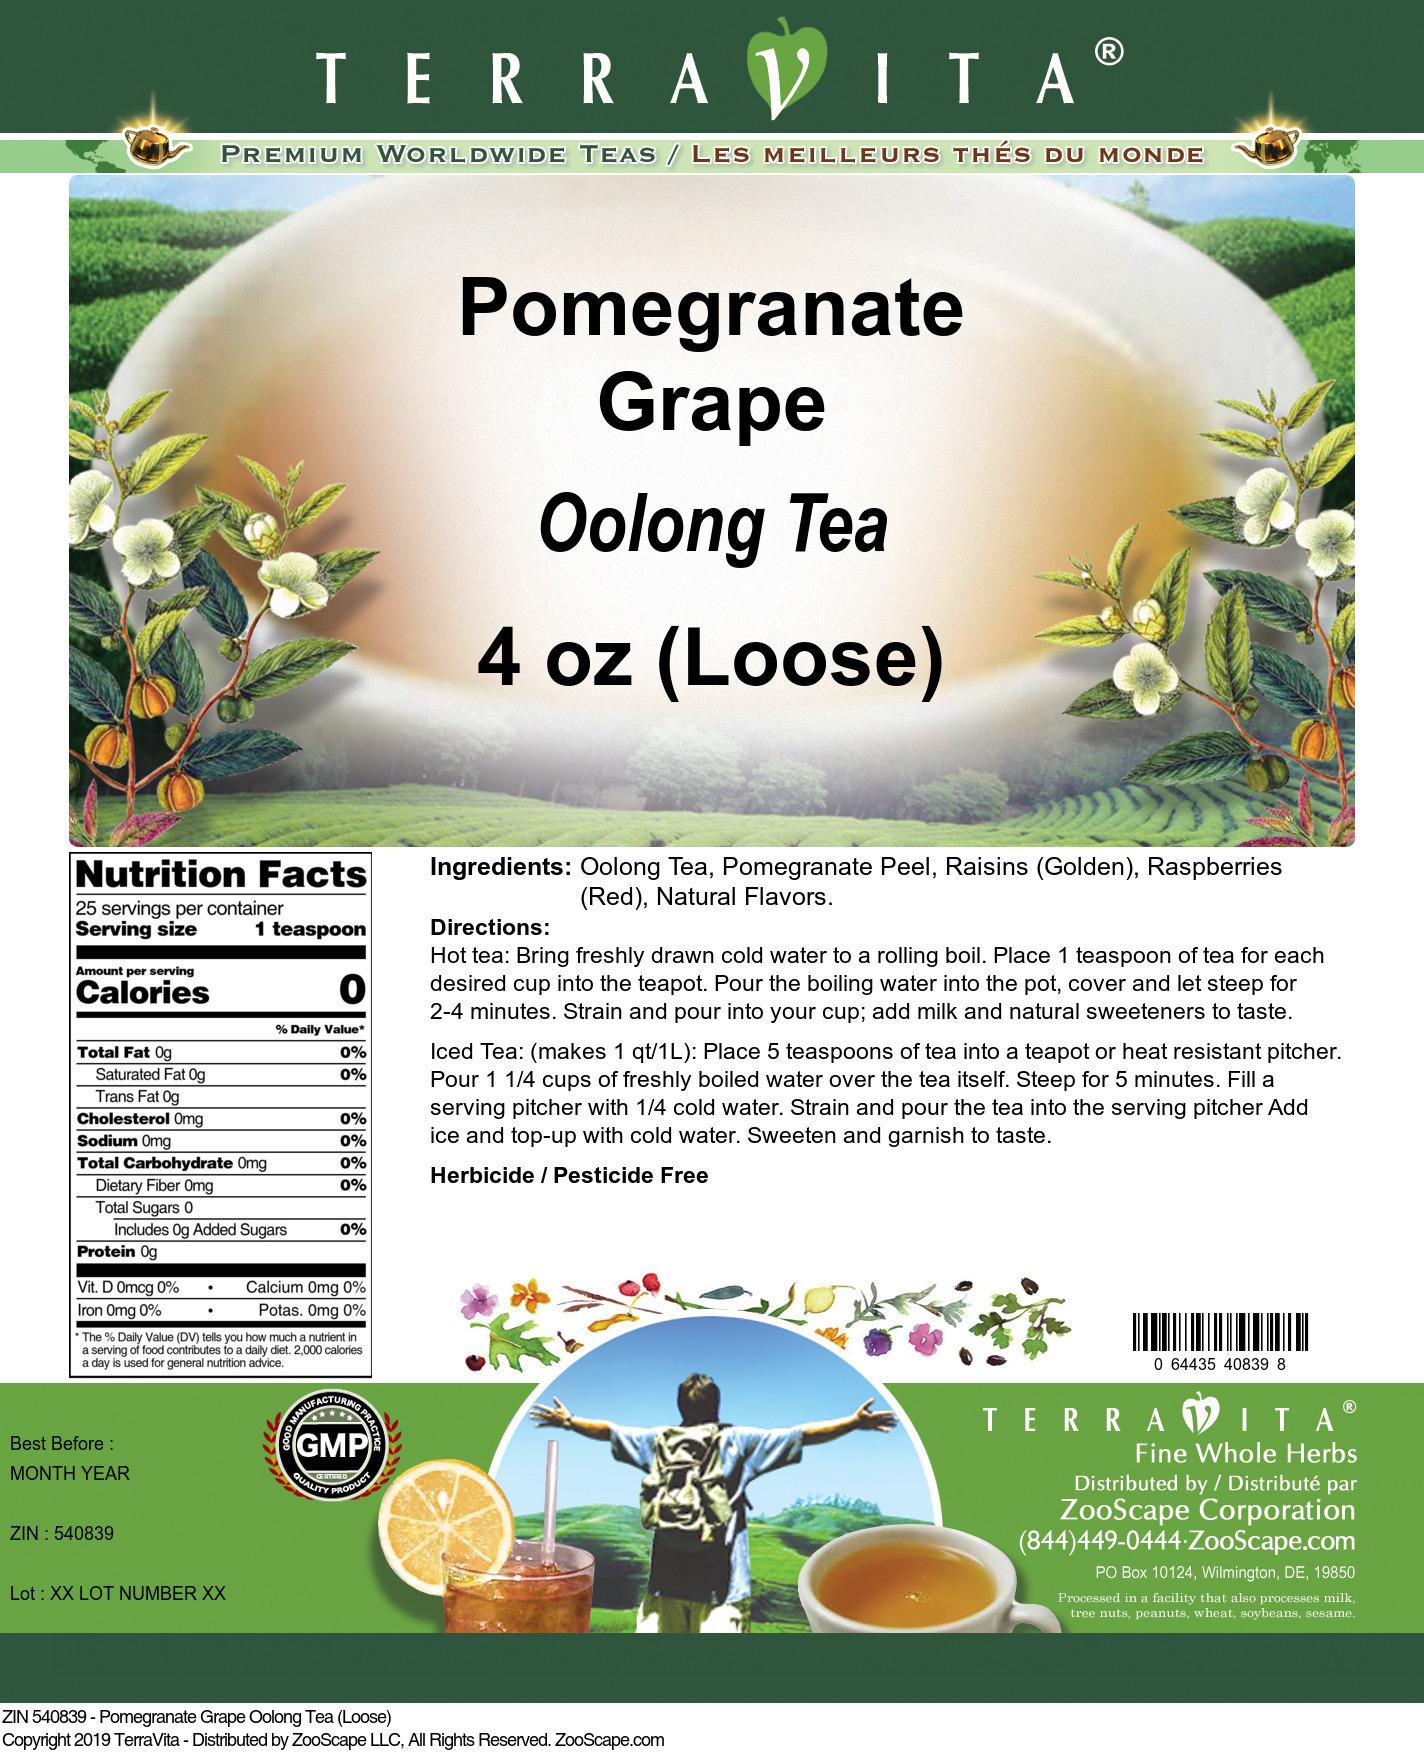 Pomegranate Grape Oolong Tea